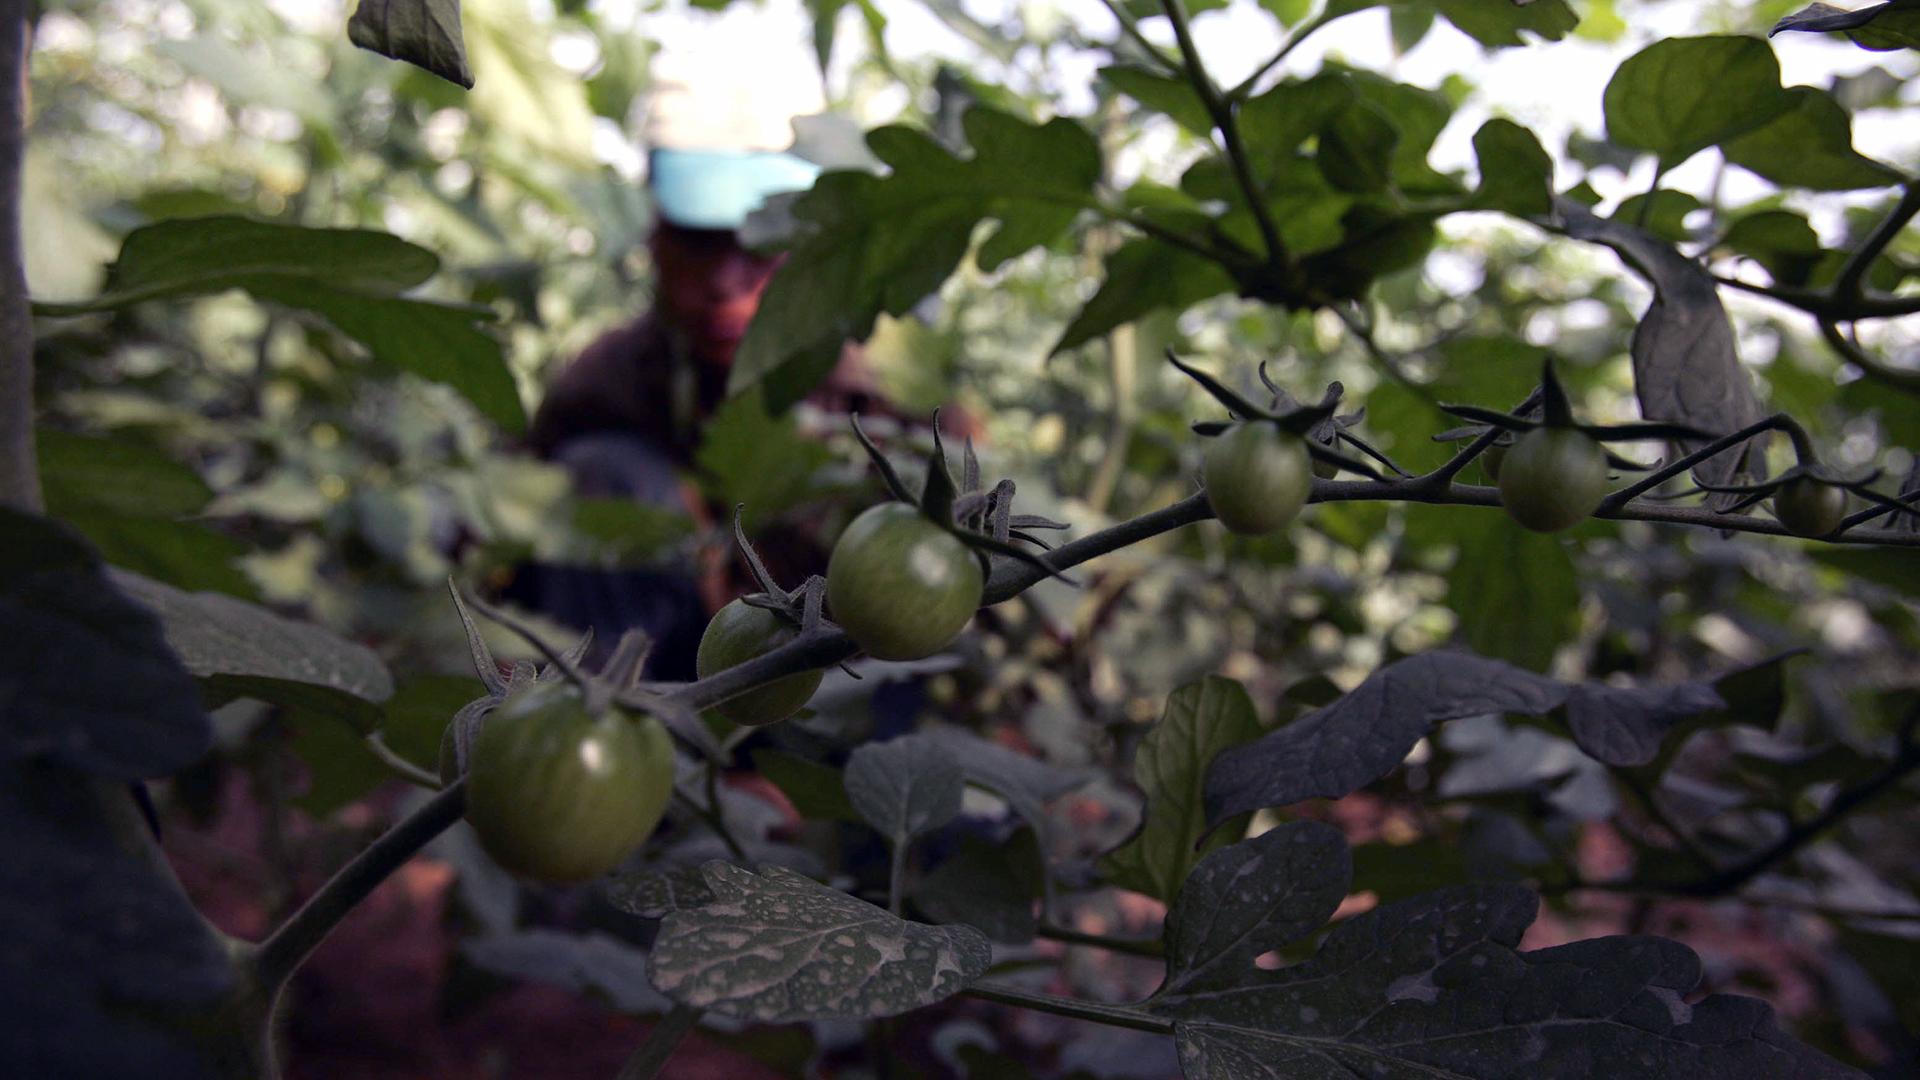 Green tomatoes on plant-159532.jpg25085216